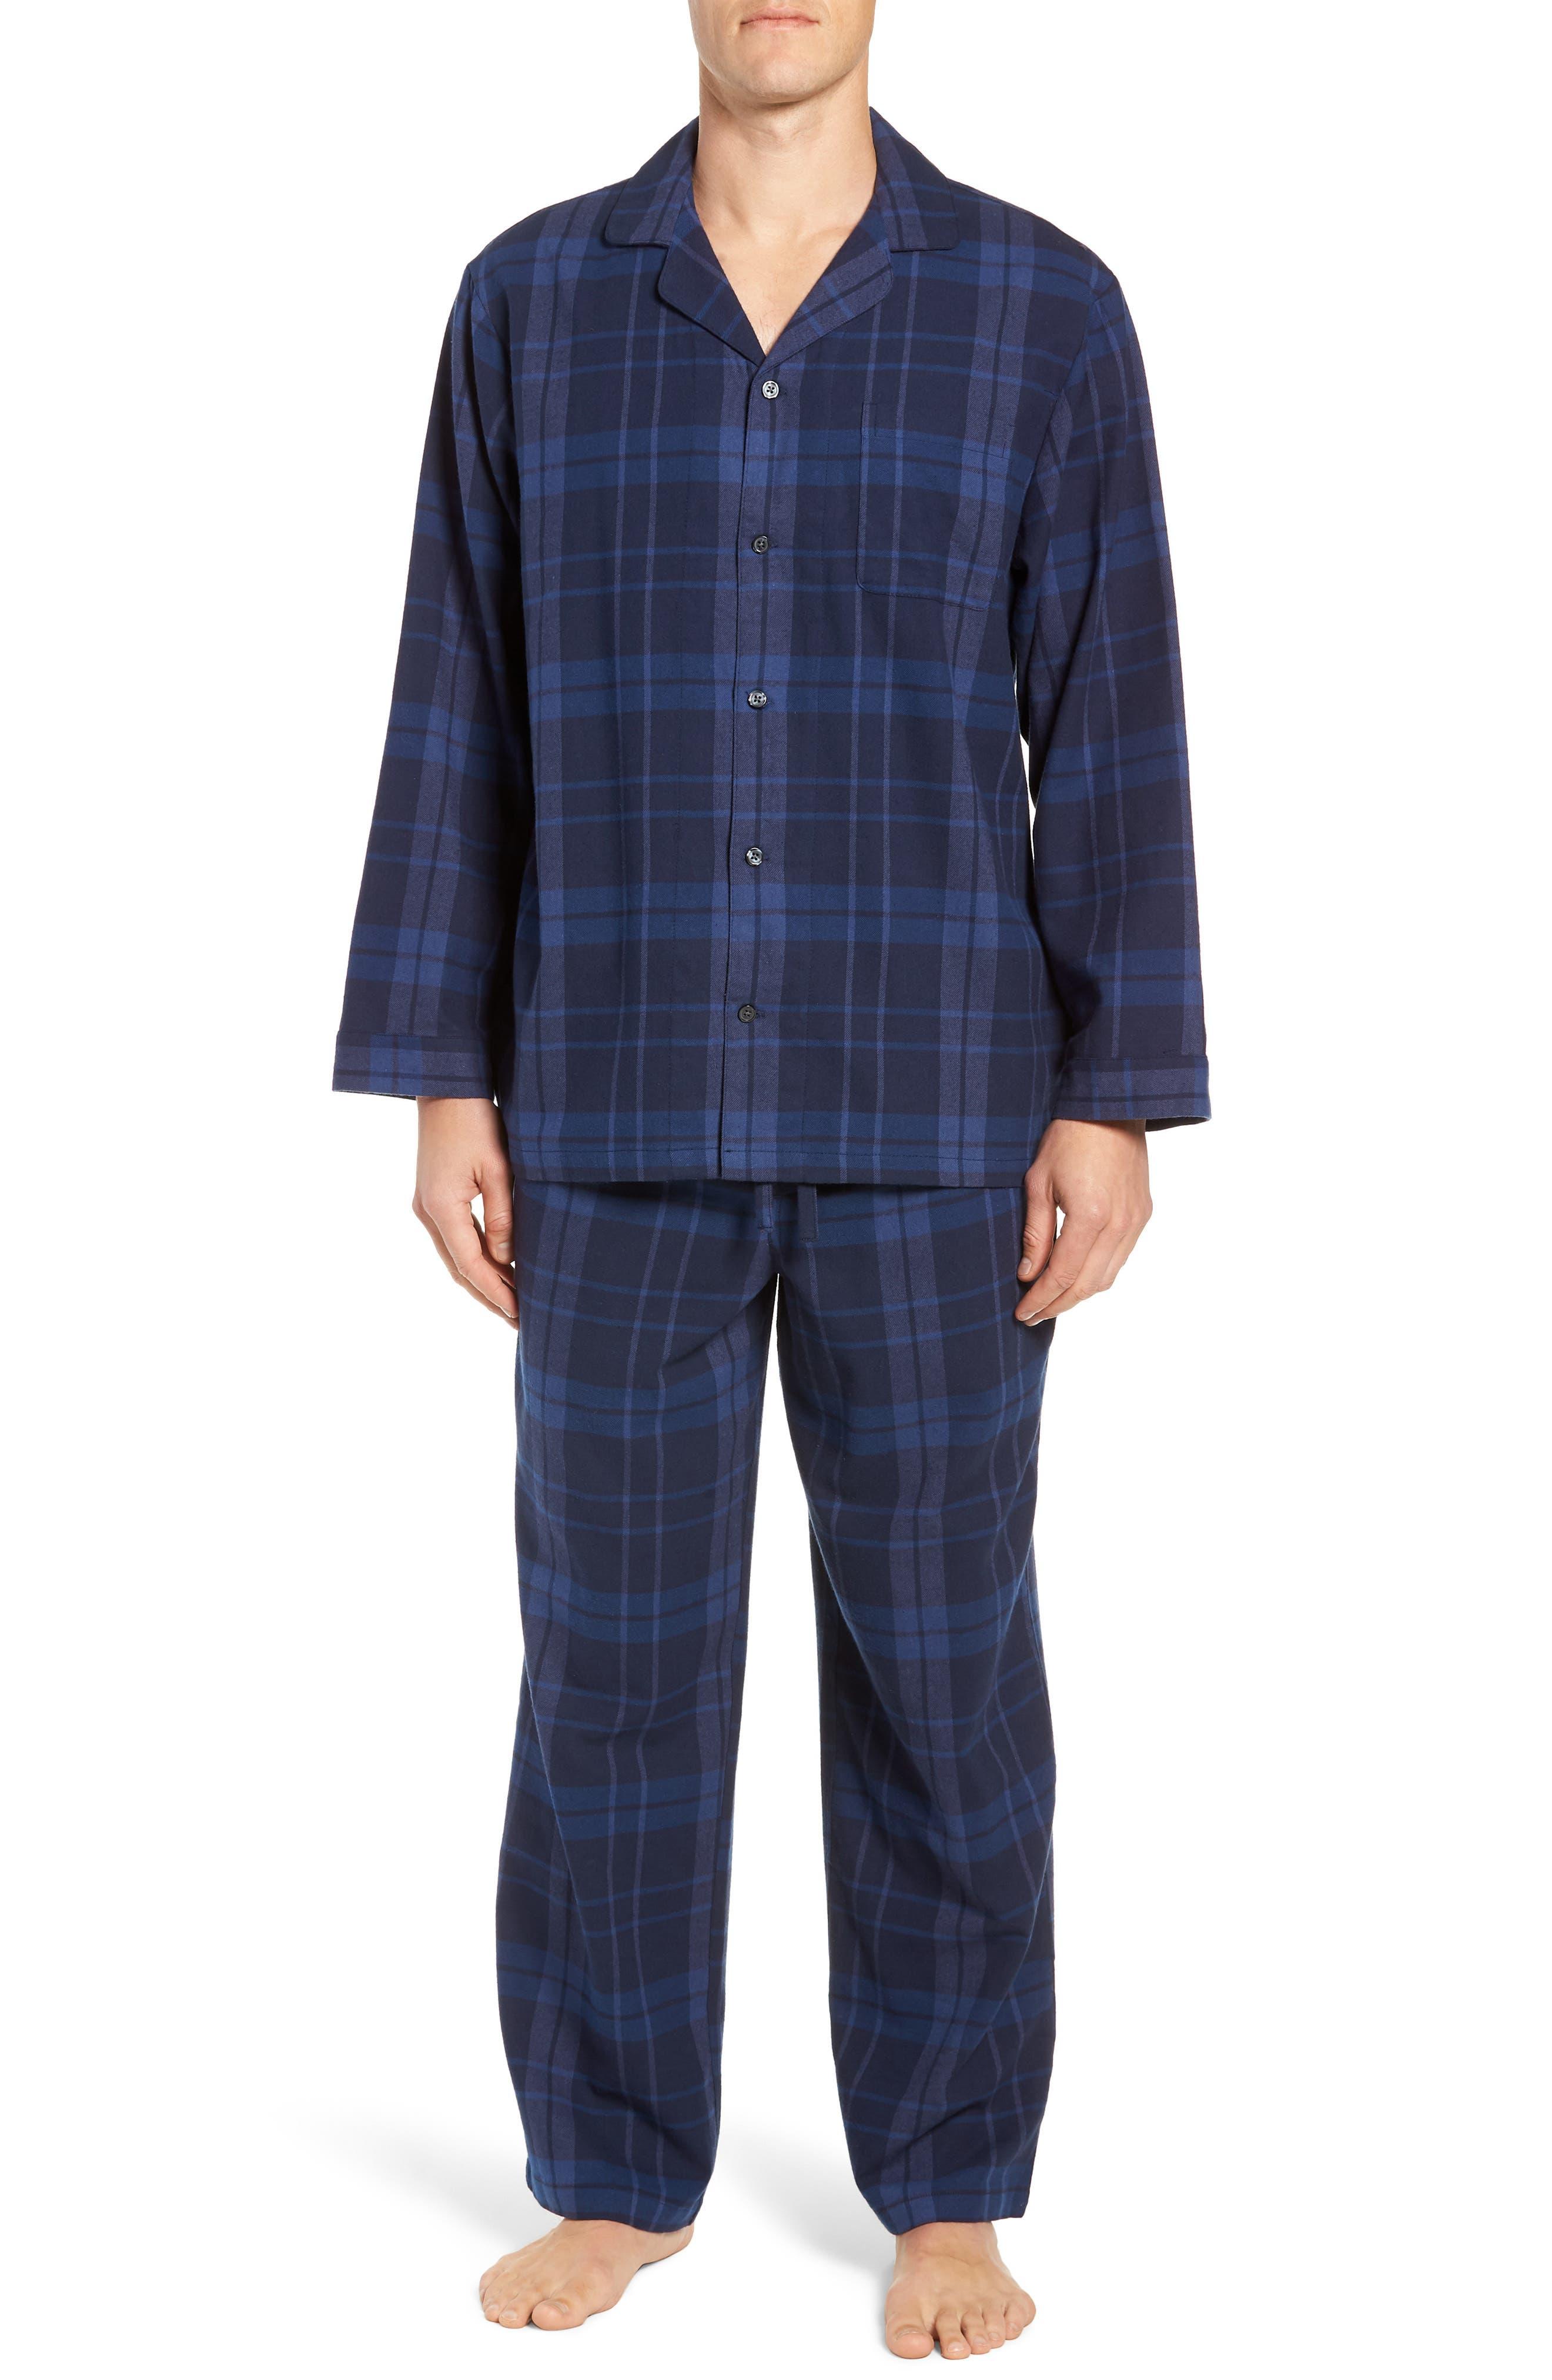 '824' Flannel Pajama Set,                             Main thumbnail 9, color,